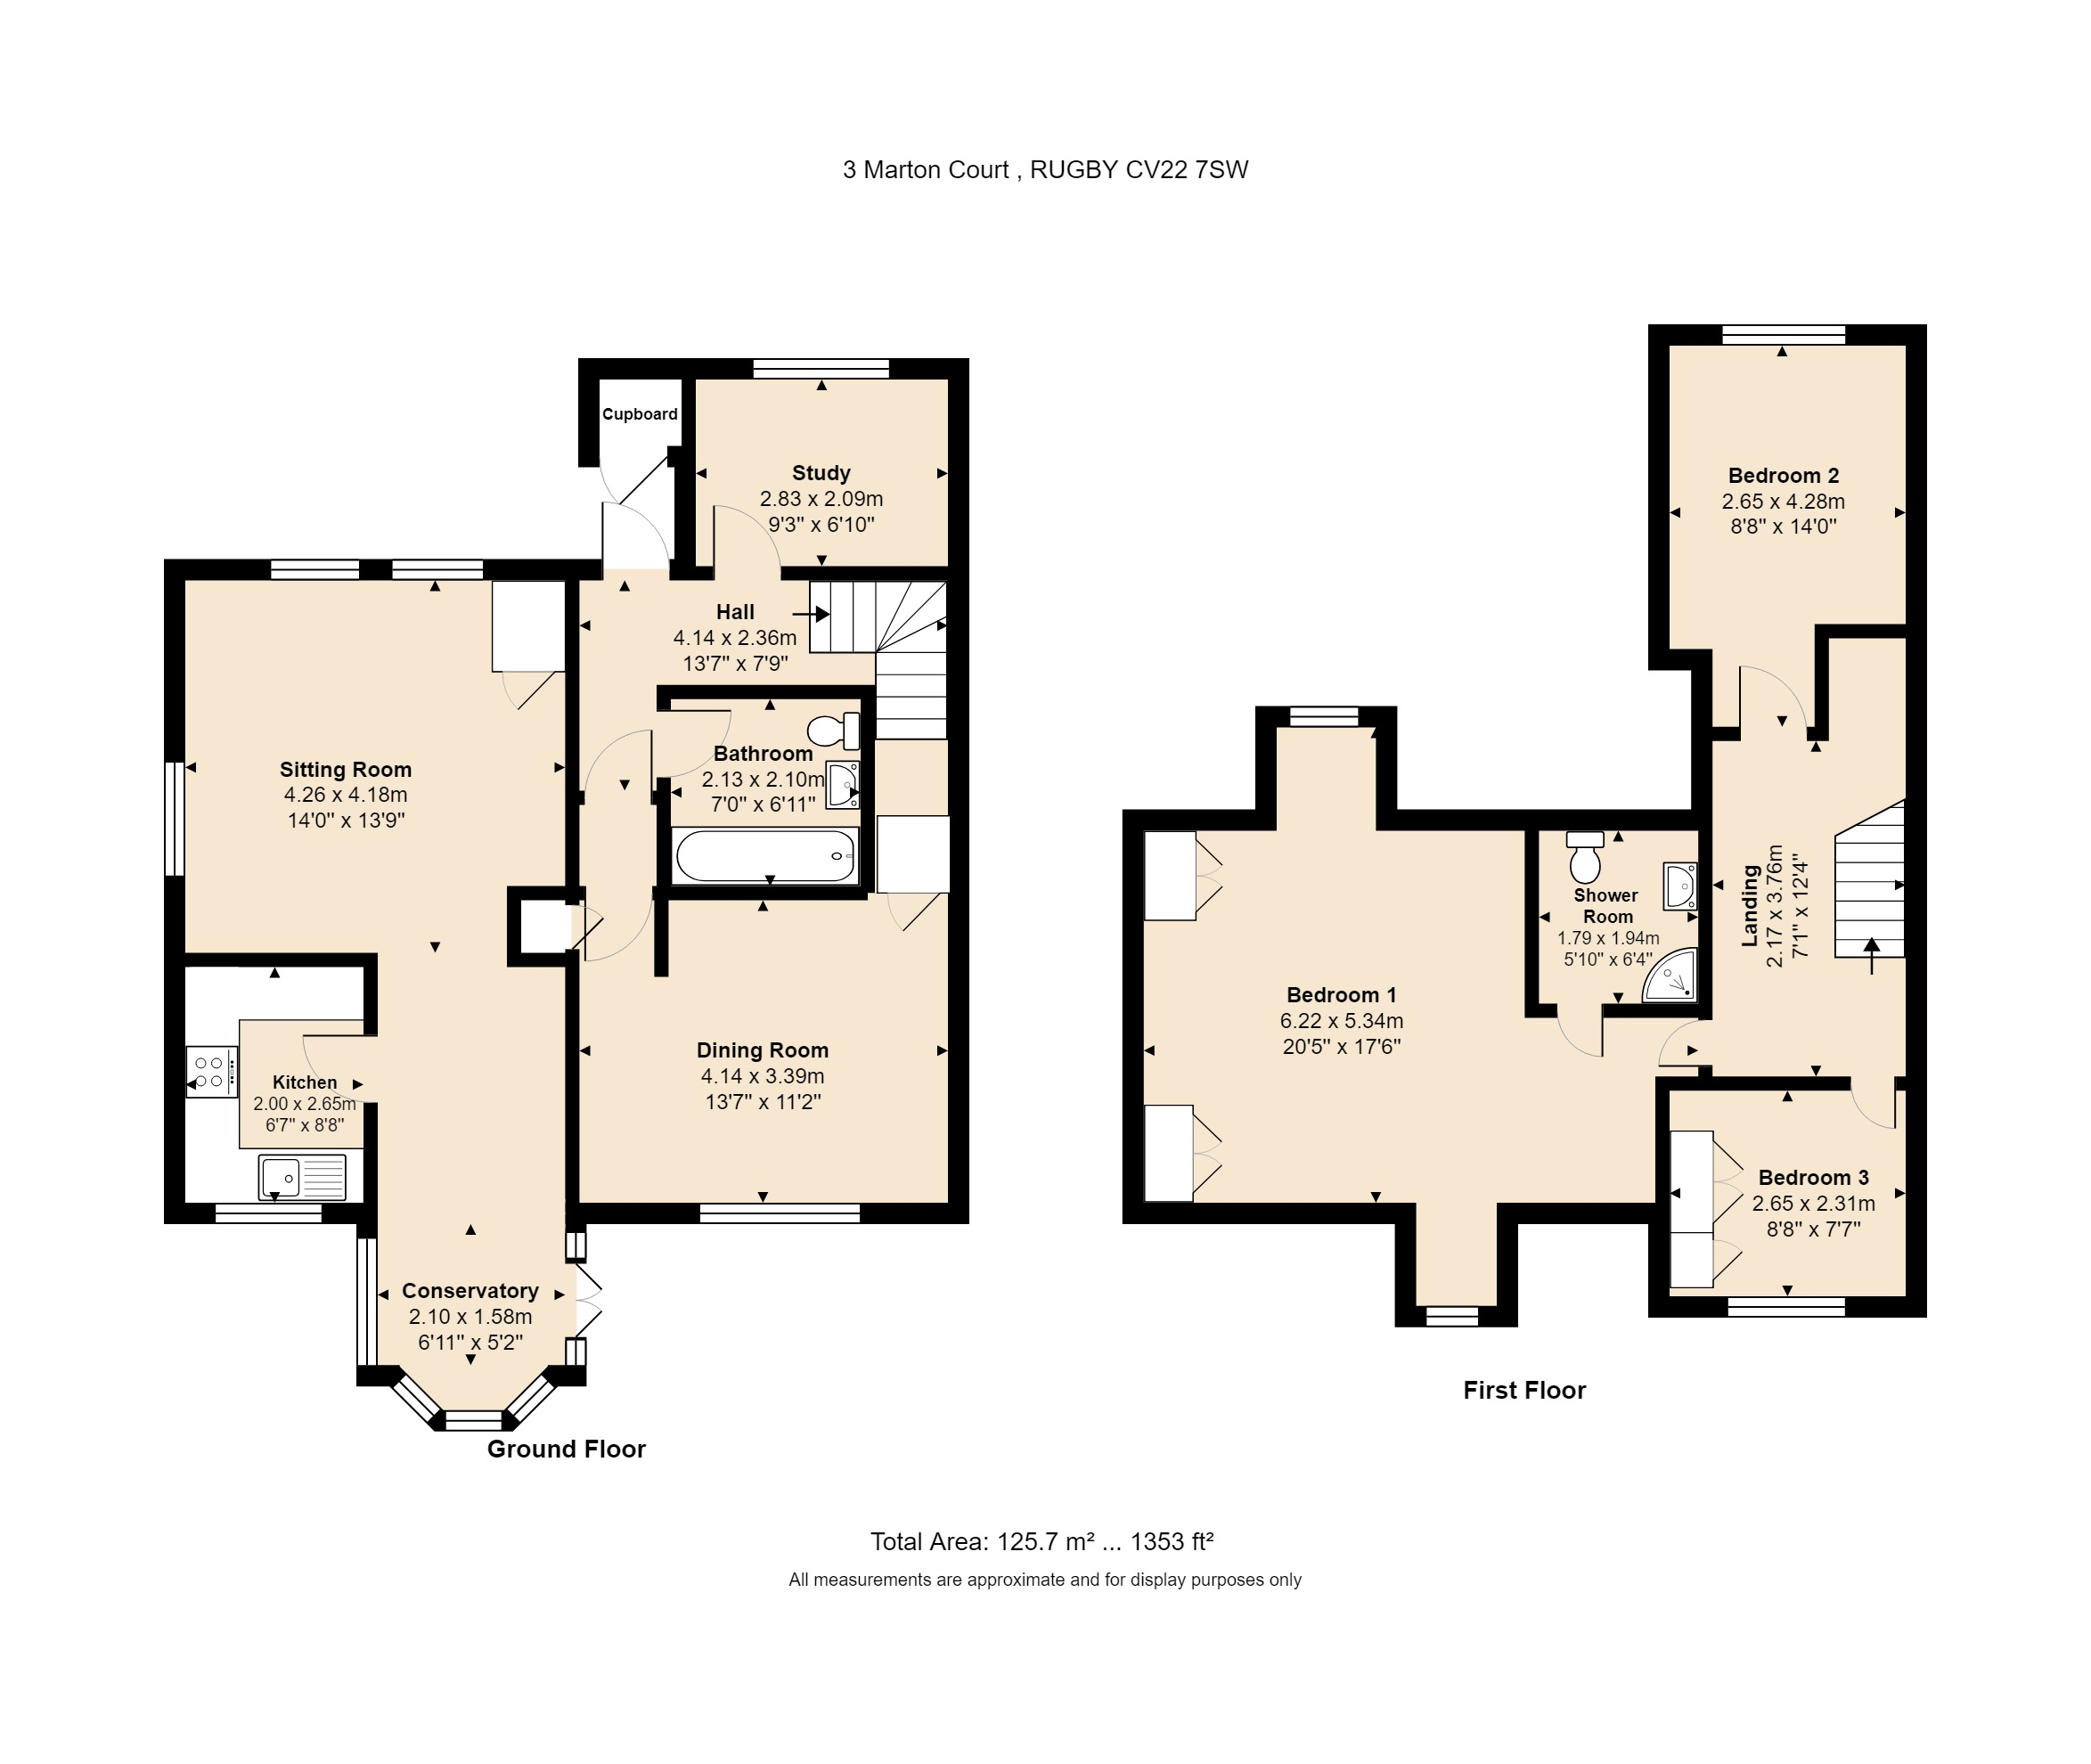 3 Marton Court Floorplan